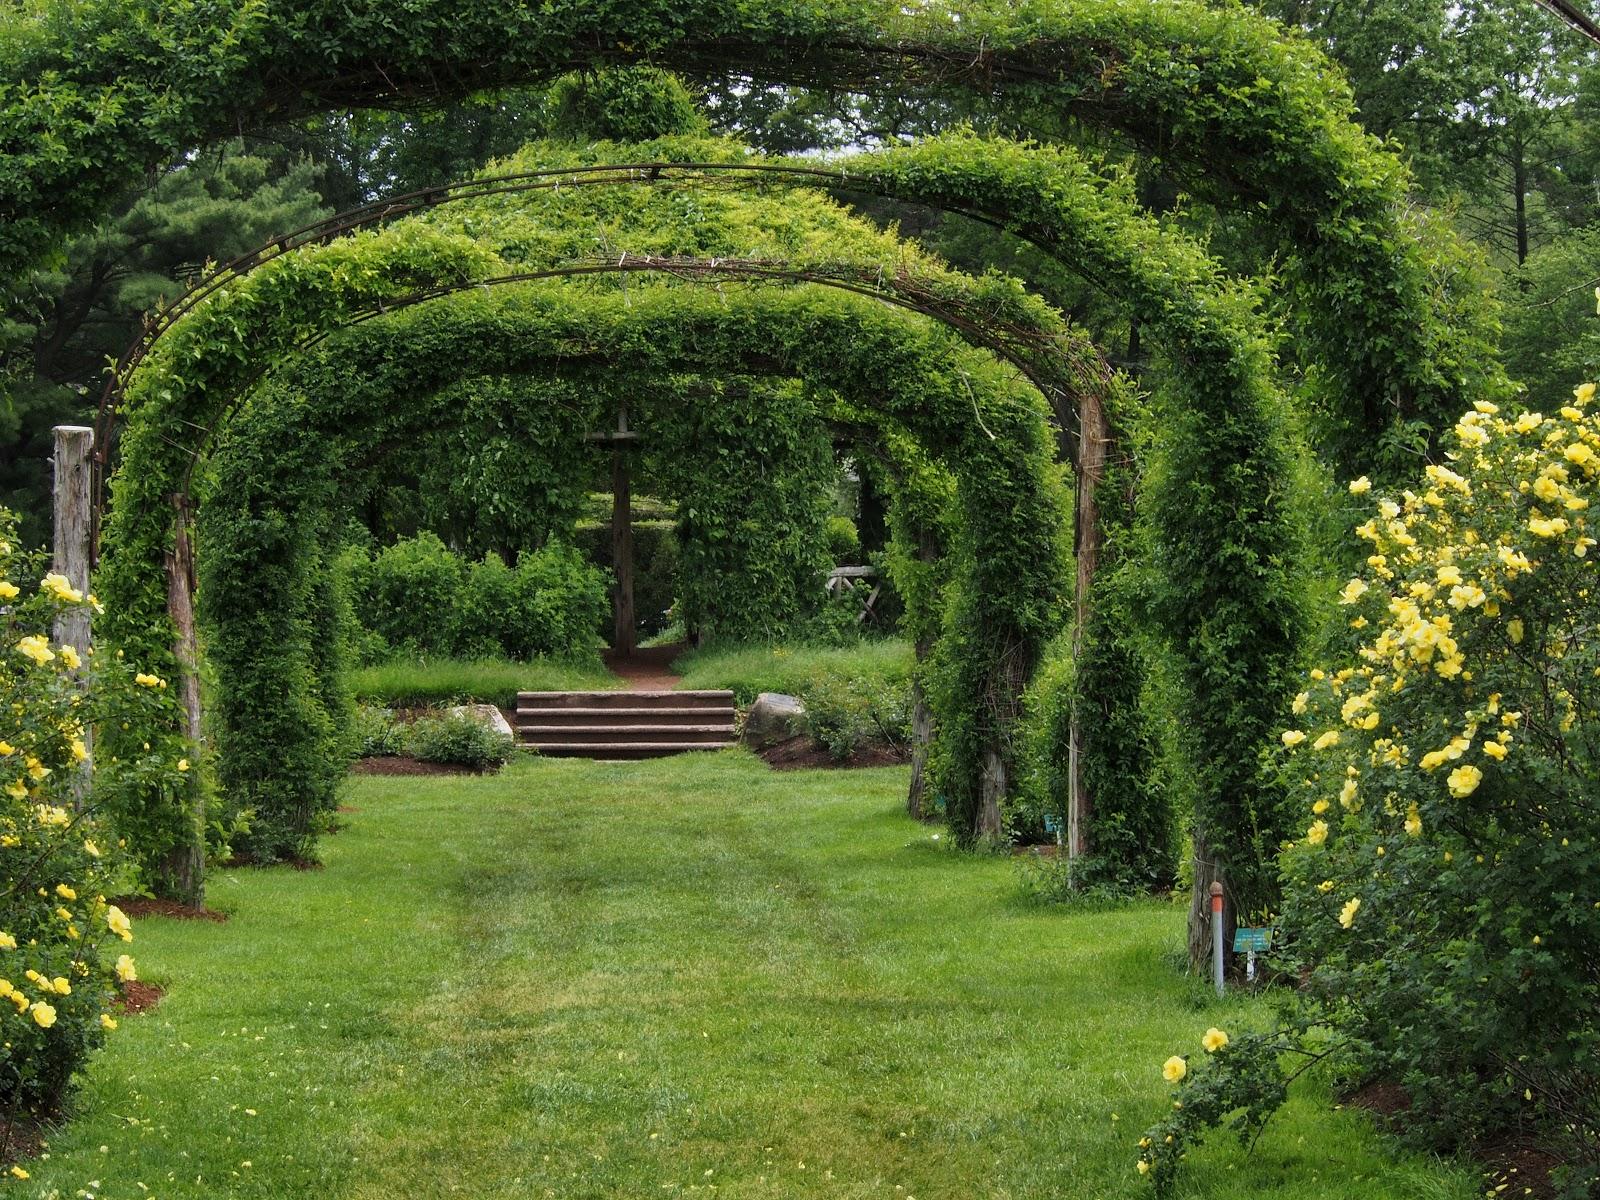 Into the Gazebo, #ElizabethPark #rosegarden 2014